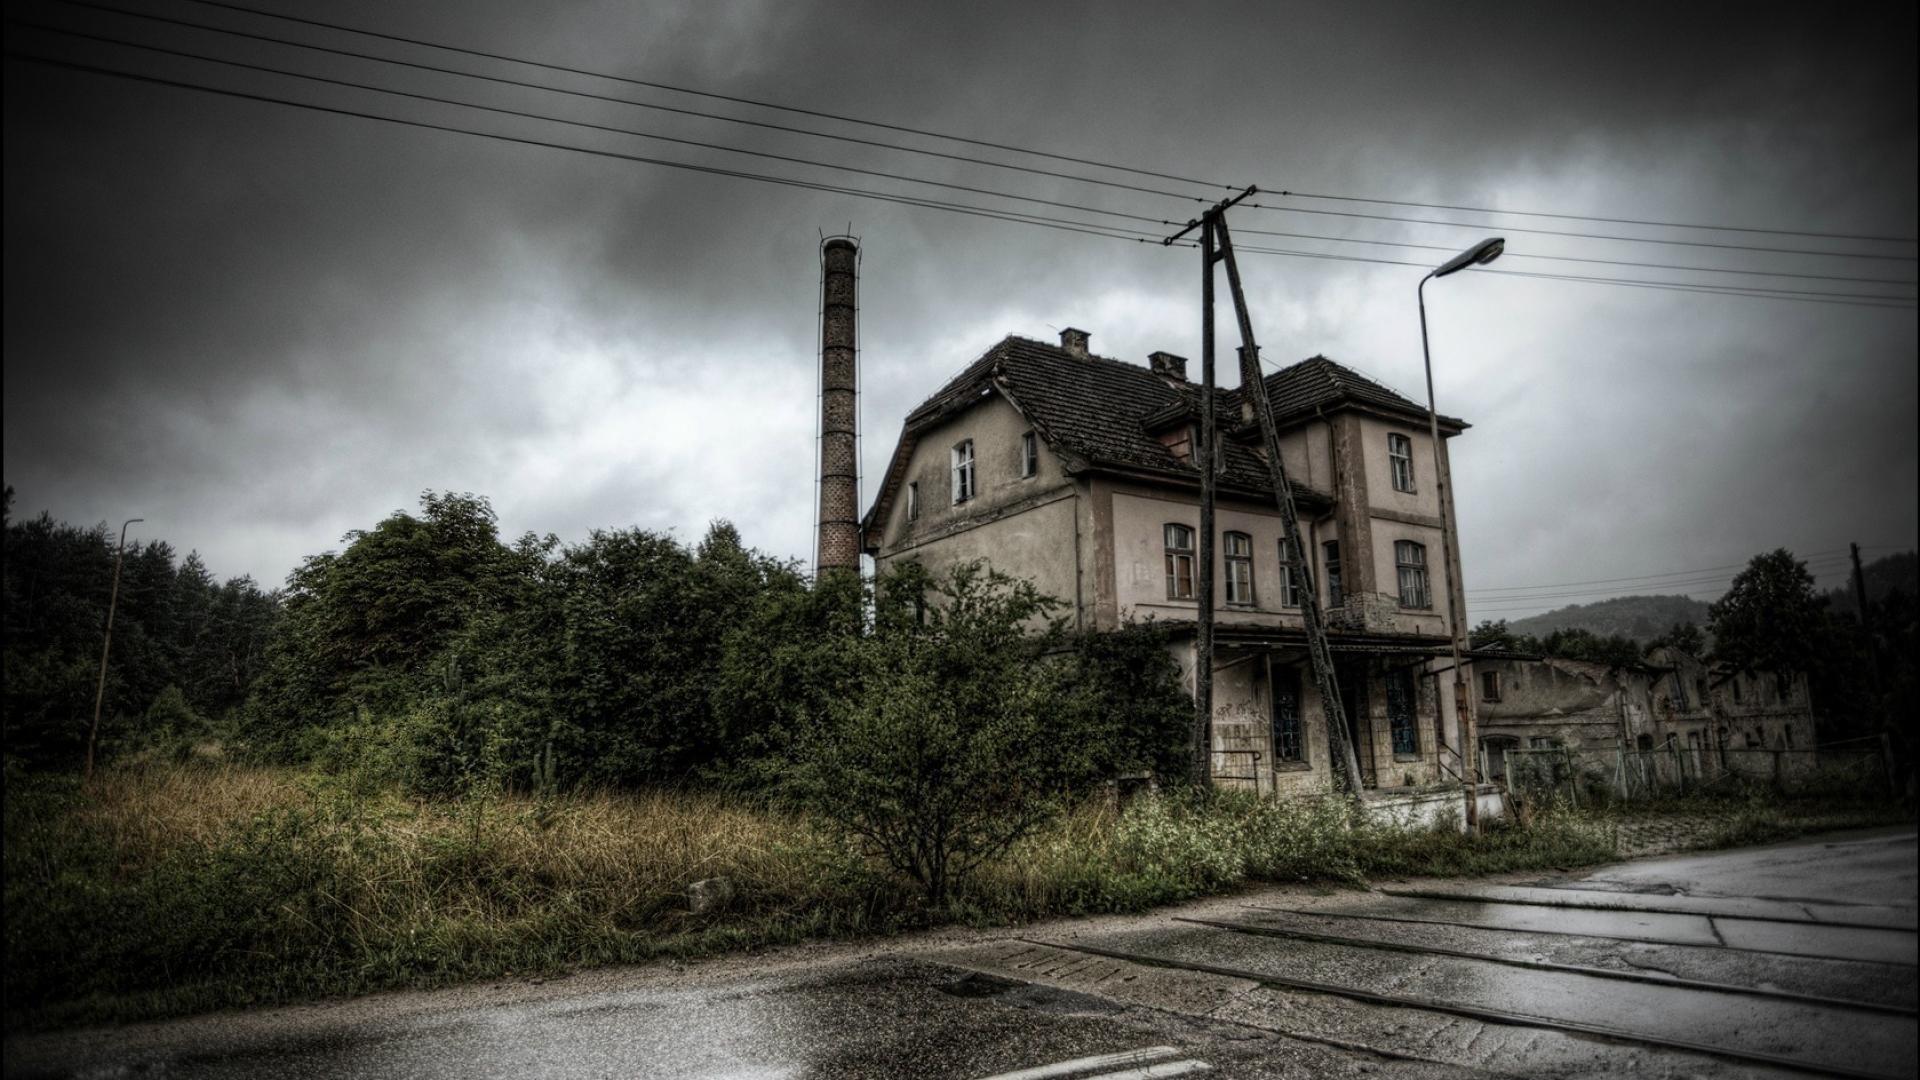 фотографии зданий в пасмурную погоду память, патріотичні почуття